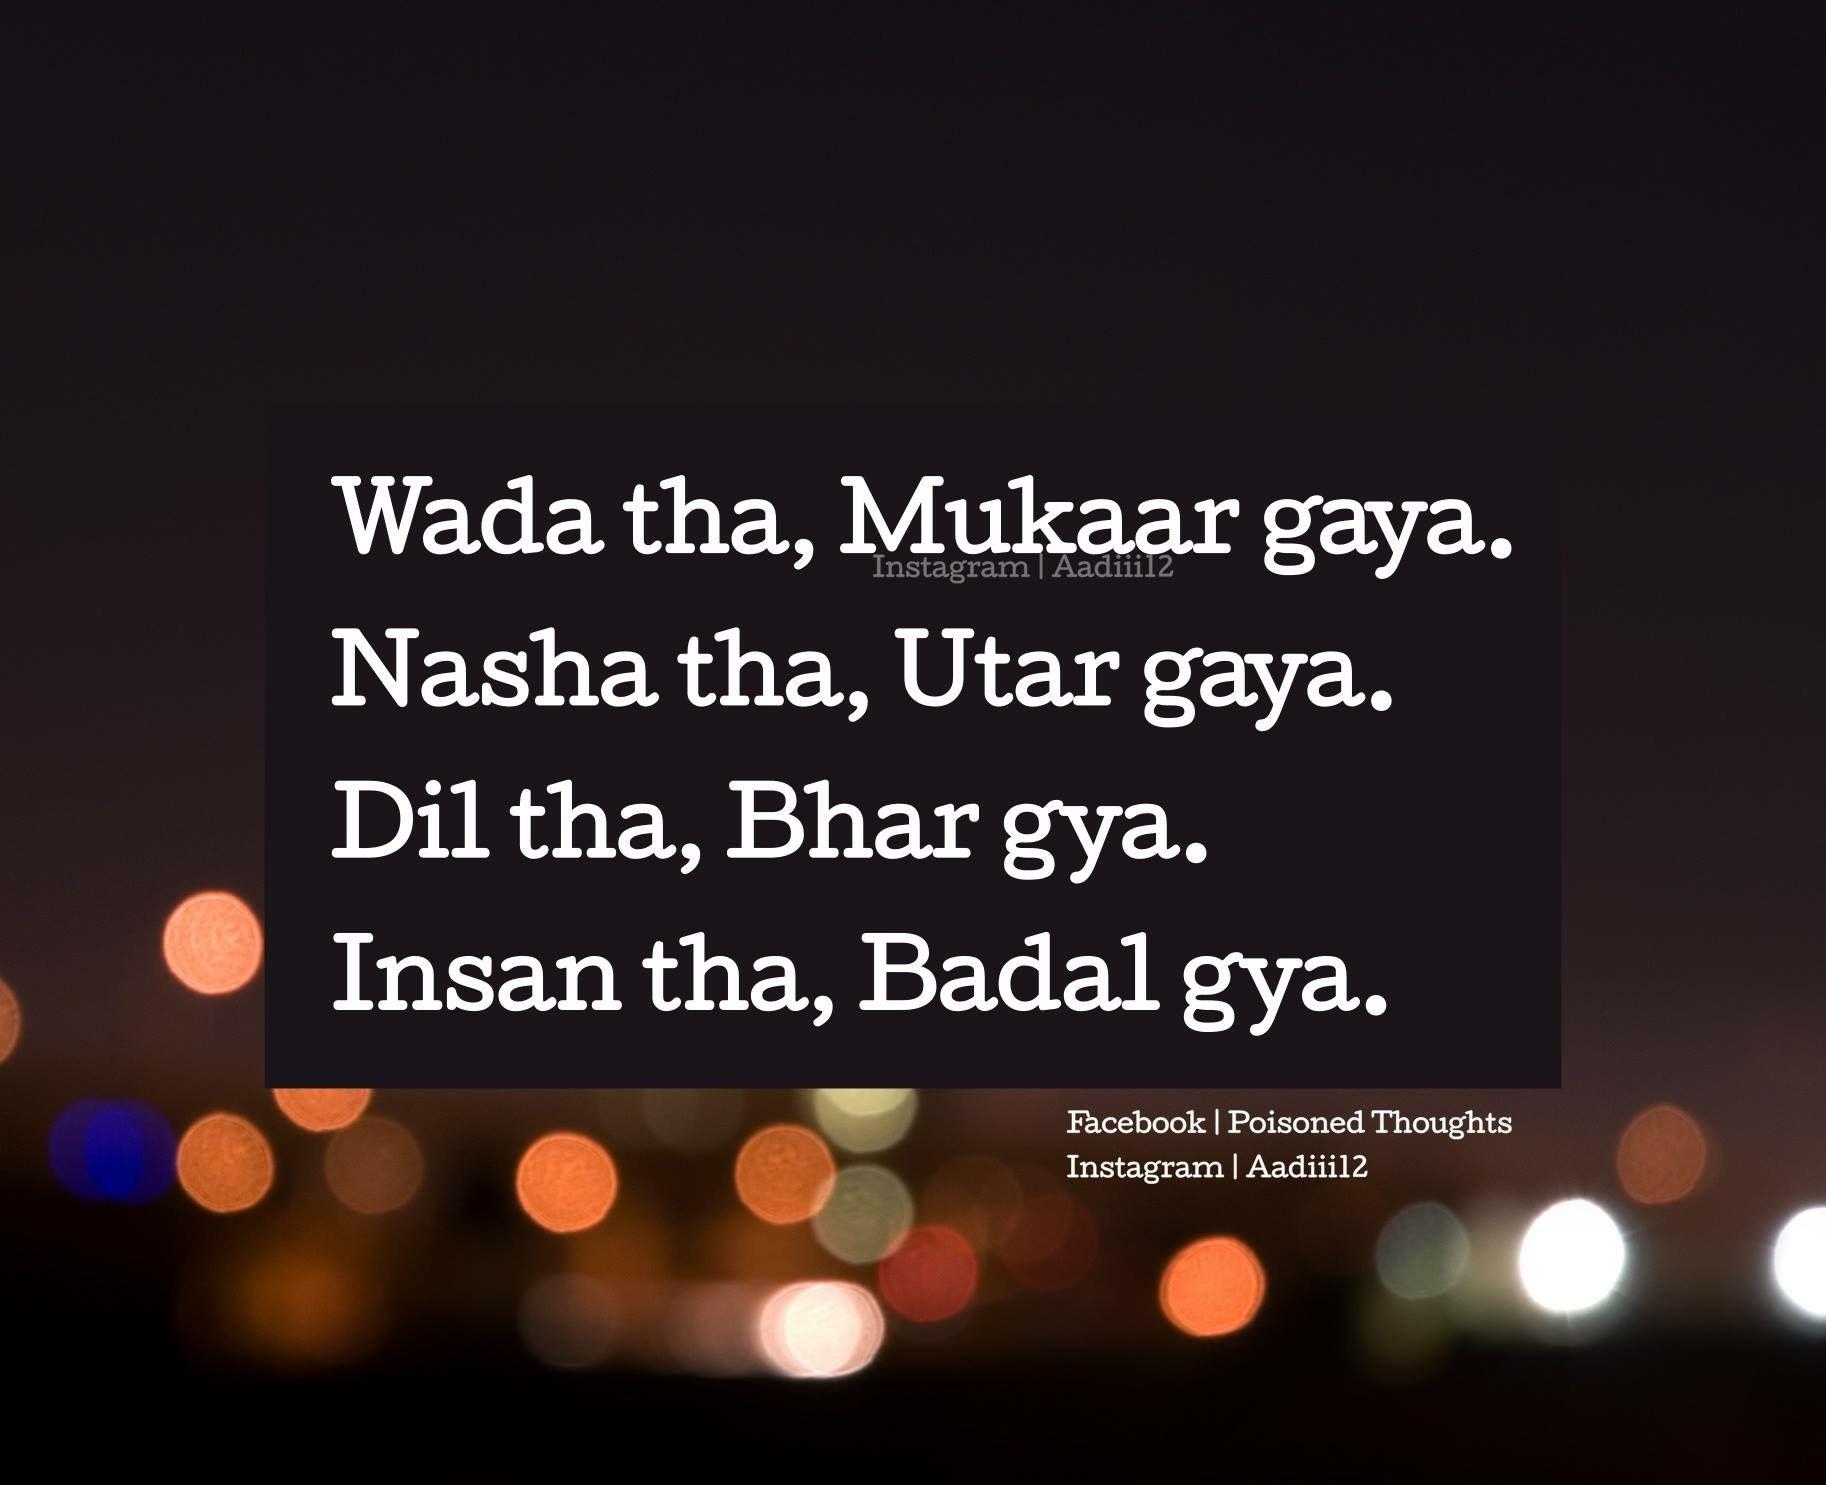 Punjabi Quotes Hindi Quotes Quotations Expectation Quotes Amazing Quotes Spider Webs Simple Quotes Life Quotes Sad Quotes